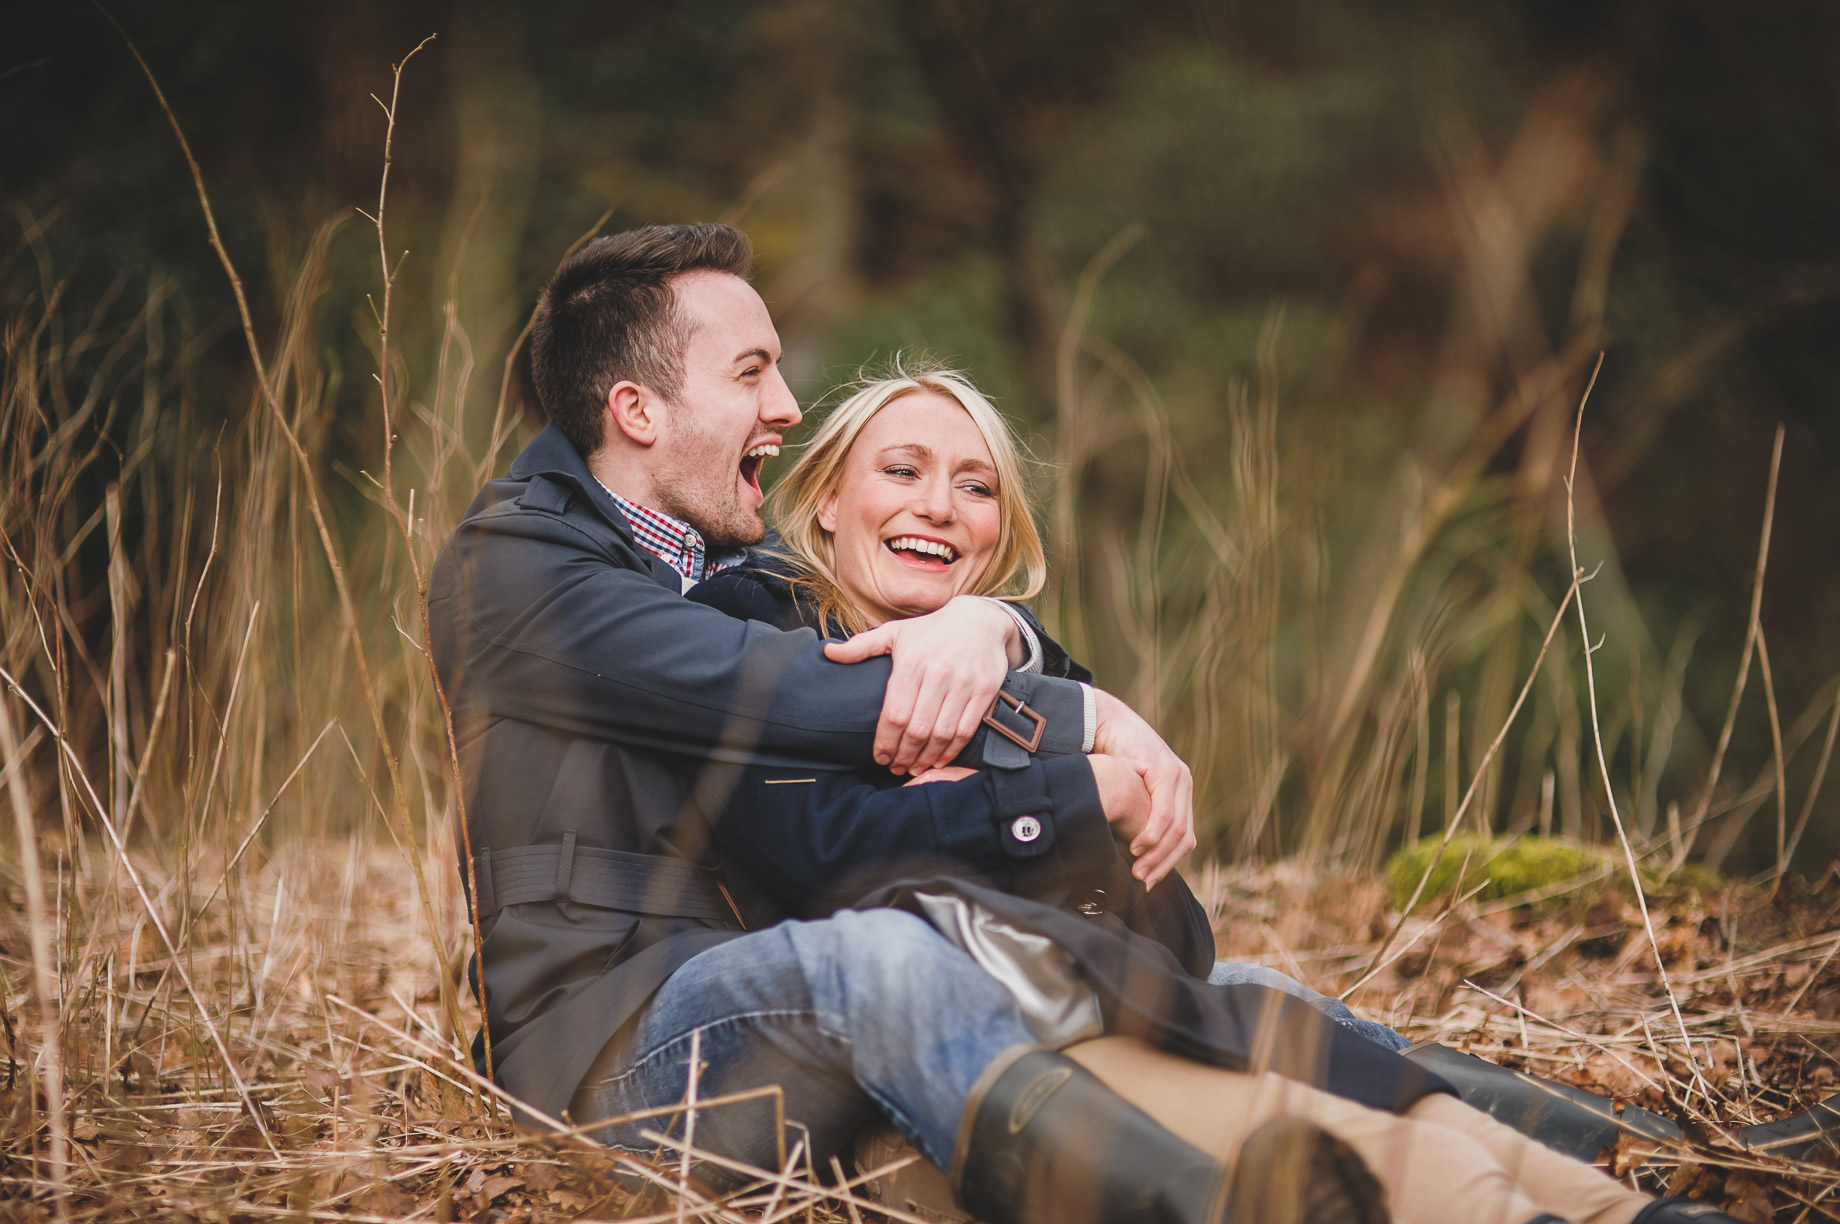 Rachel and Christian Pre-Wedding Shoot at Errwood Hall Ruins 022